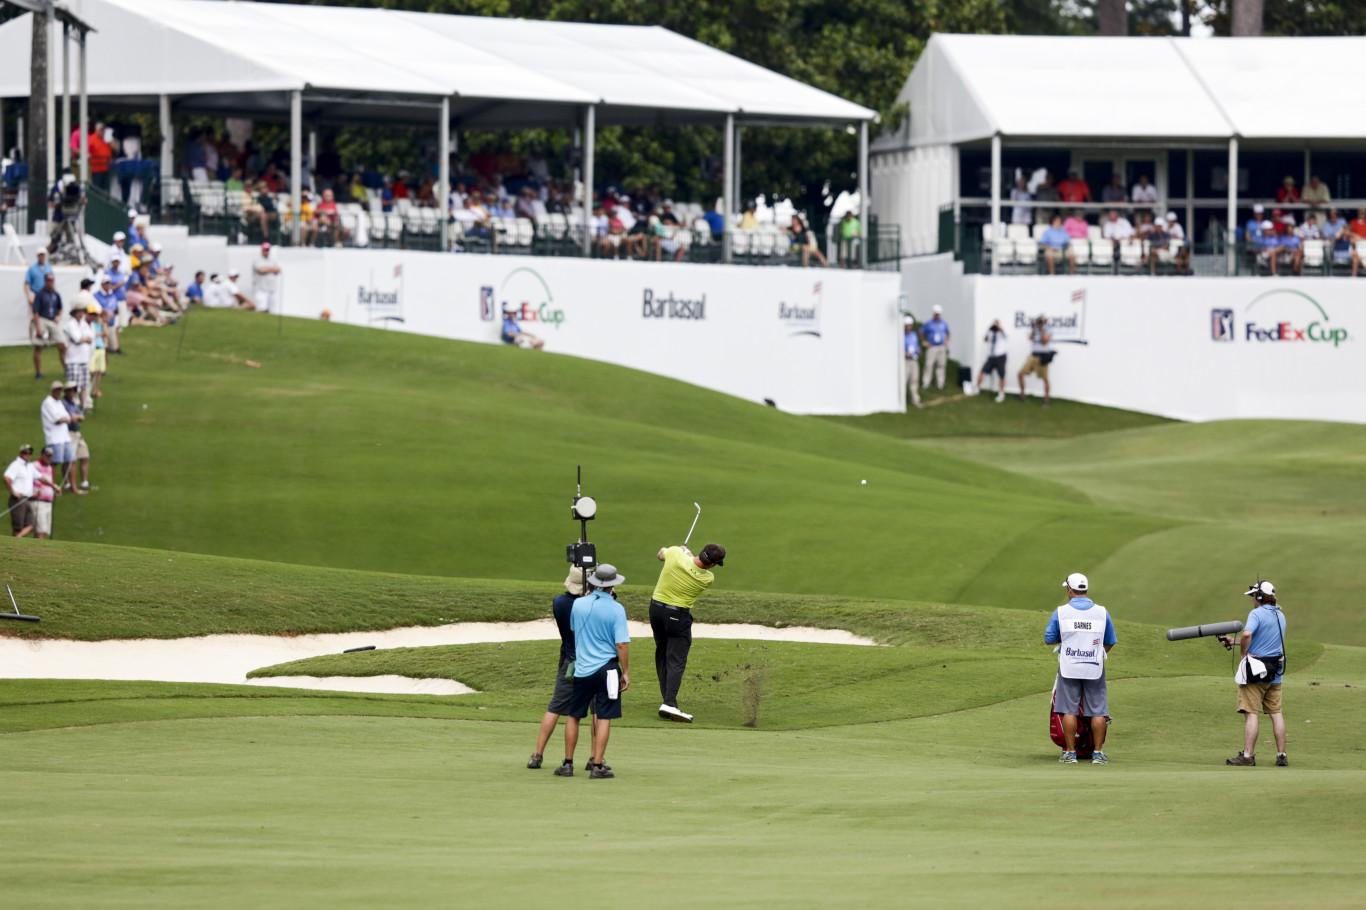 Golfer-and-background-w1366.jpg